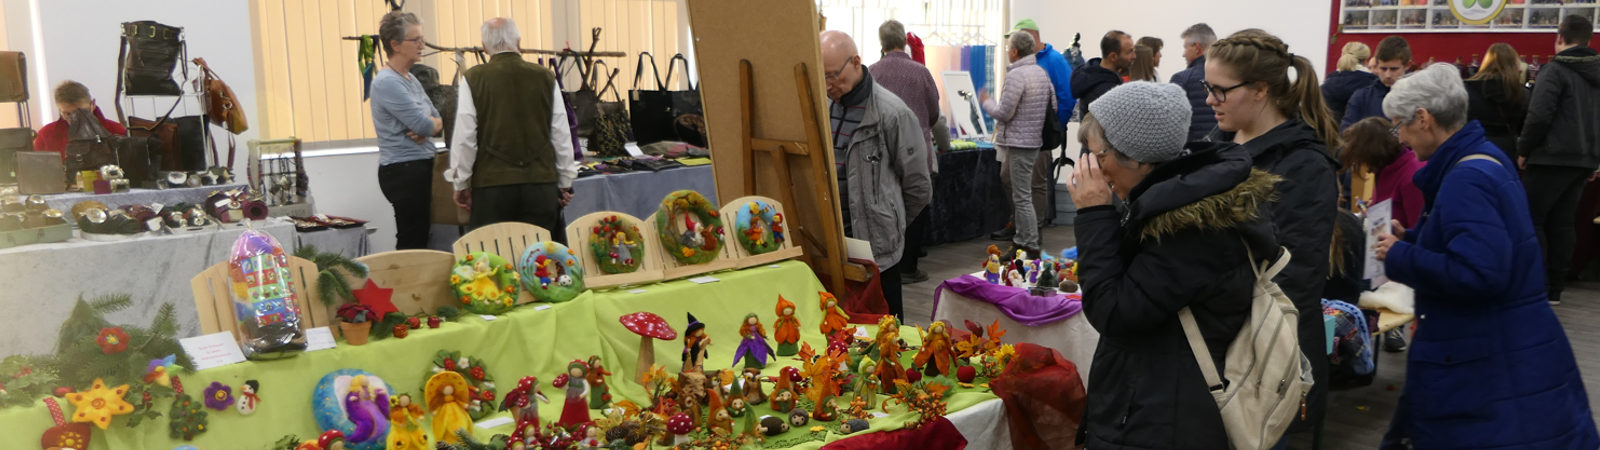 Slider-Kunsthandwerkermarkt_lindlar_2t_2